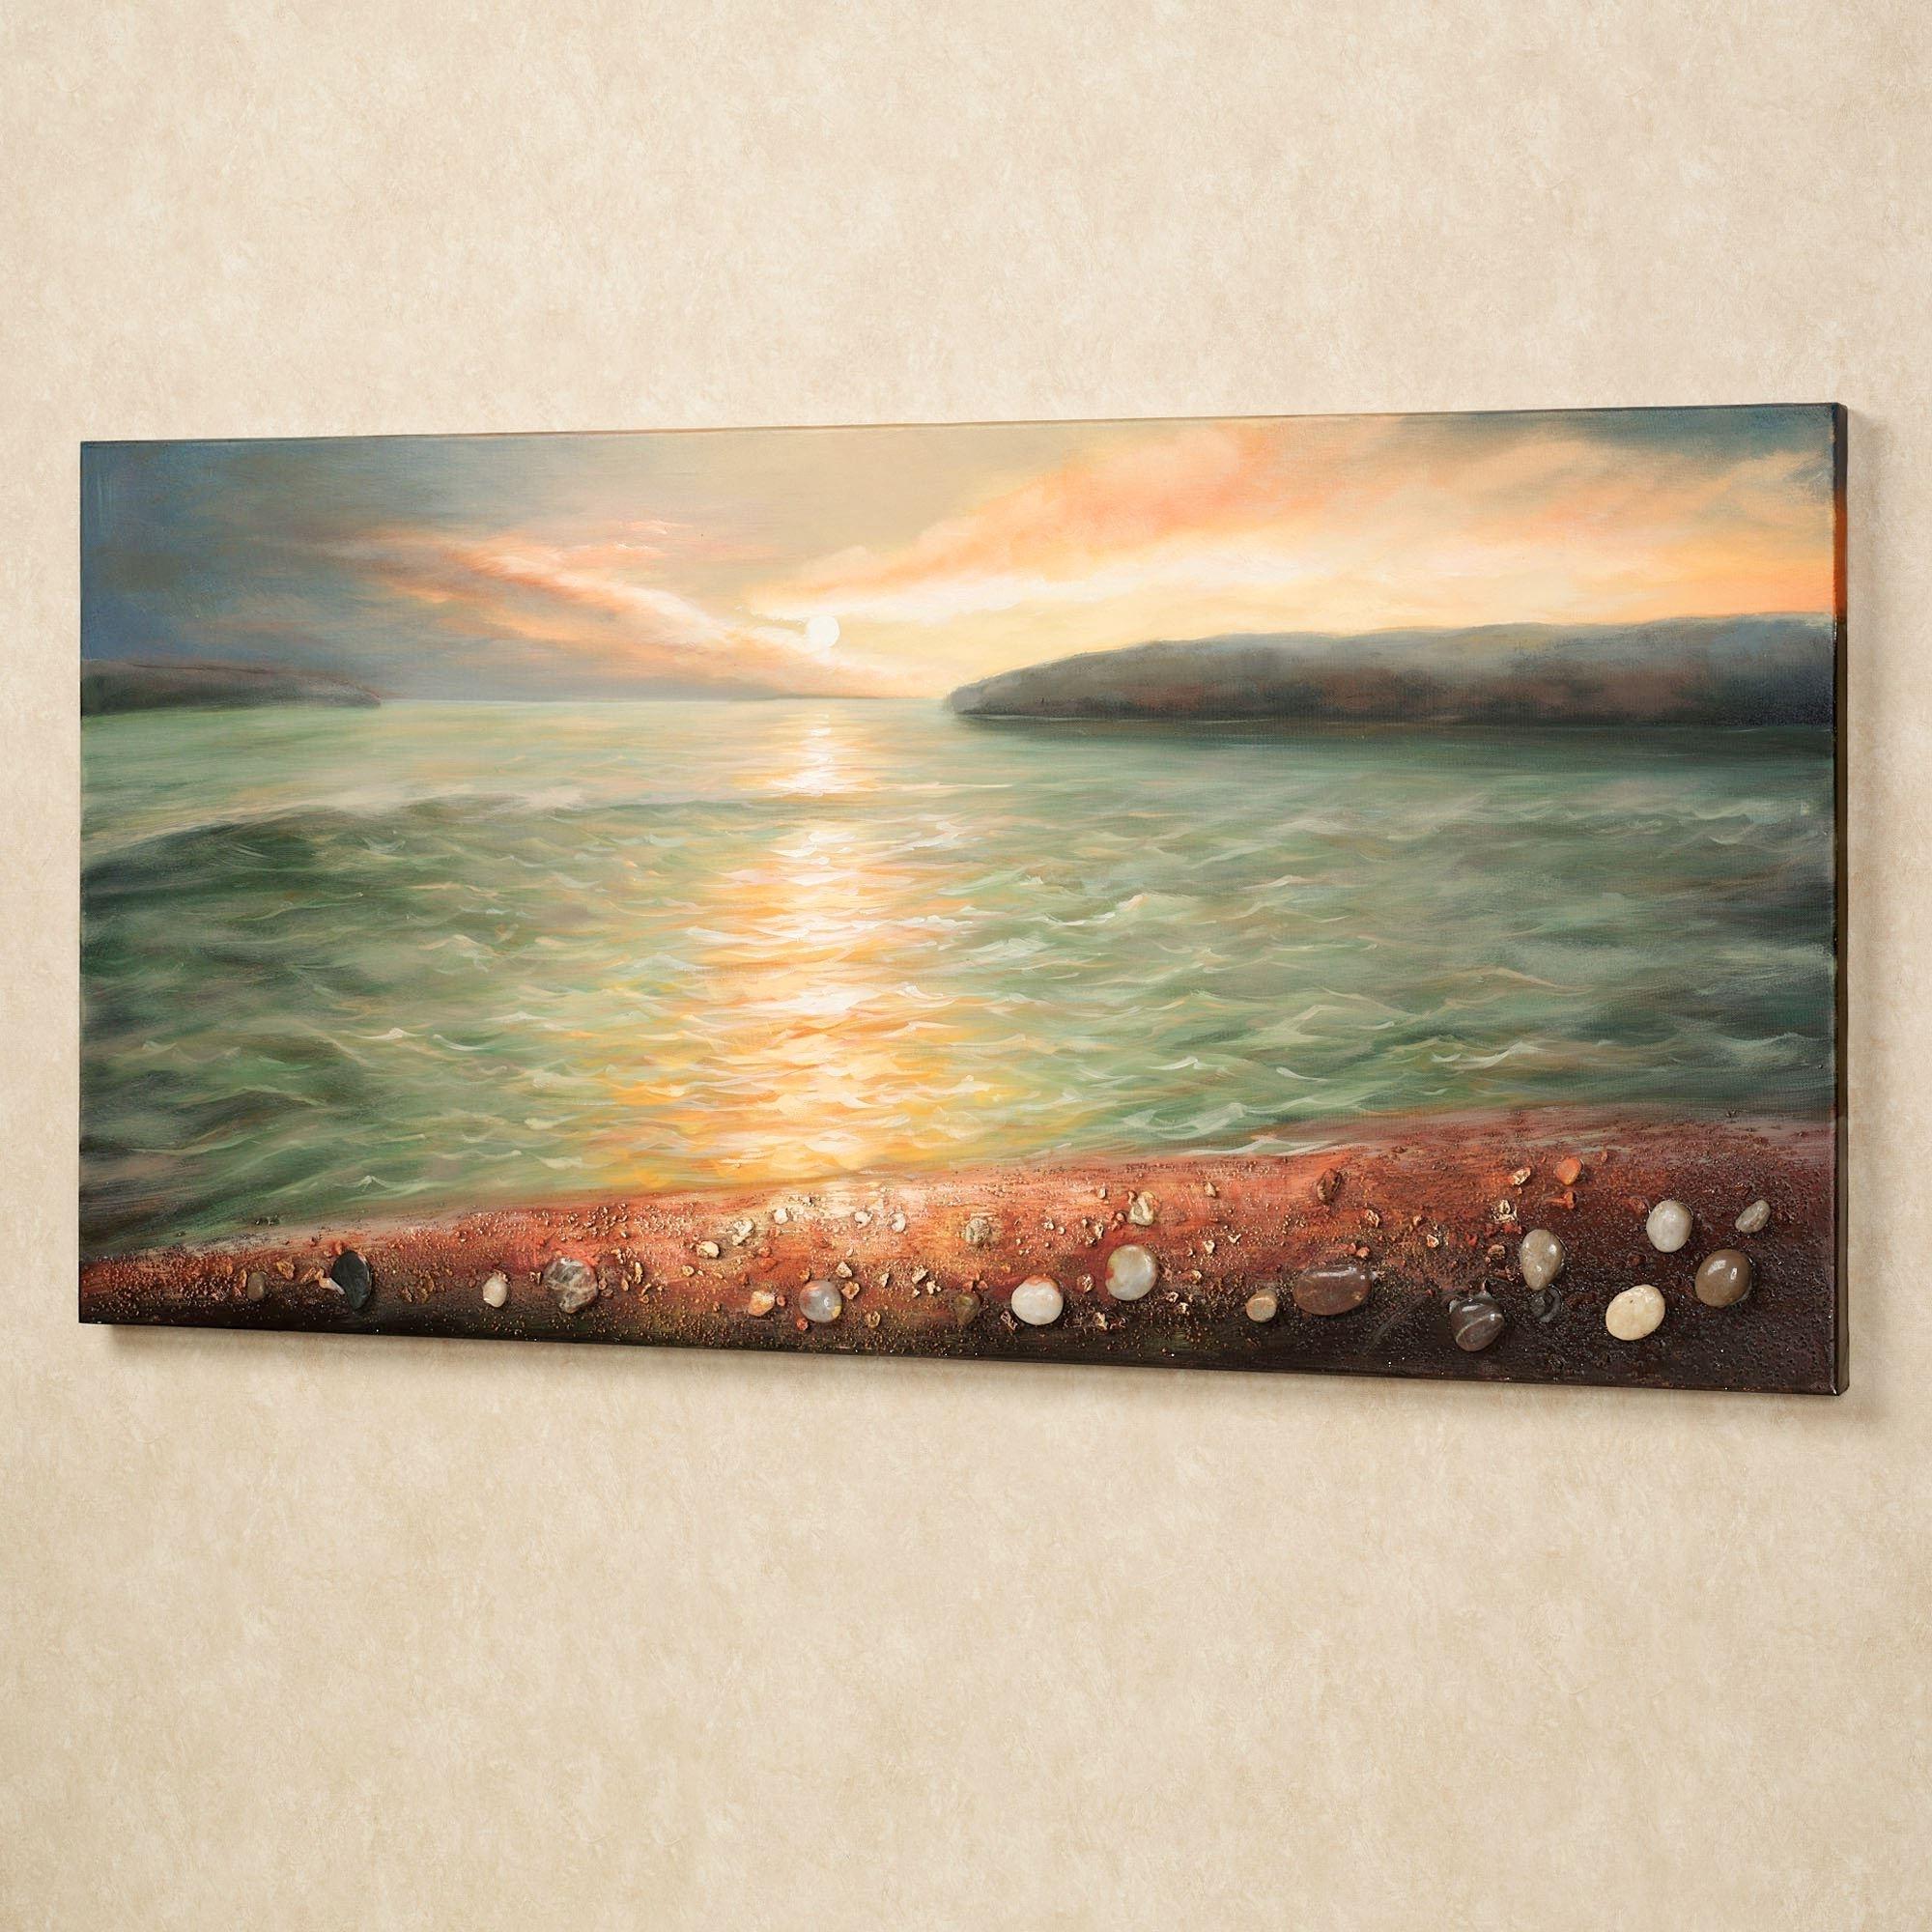 Beach Wall Art With 2017 Sunrise On Pebble Beach Canvas Wall Art (View 8 of 15)